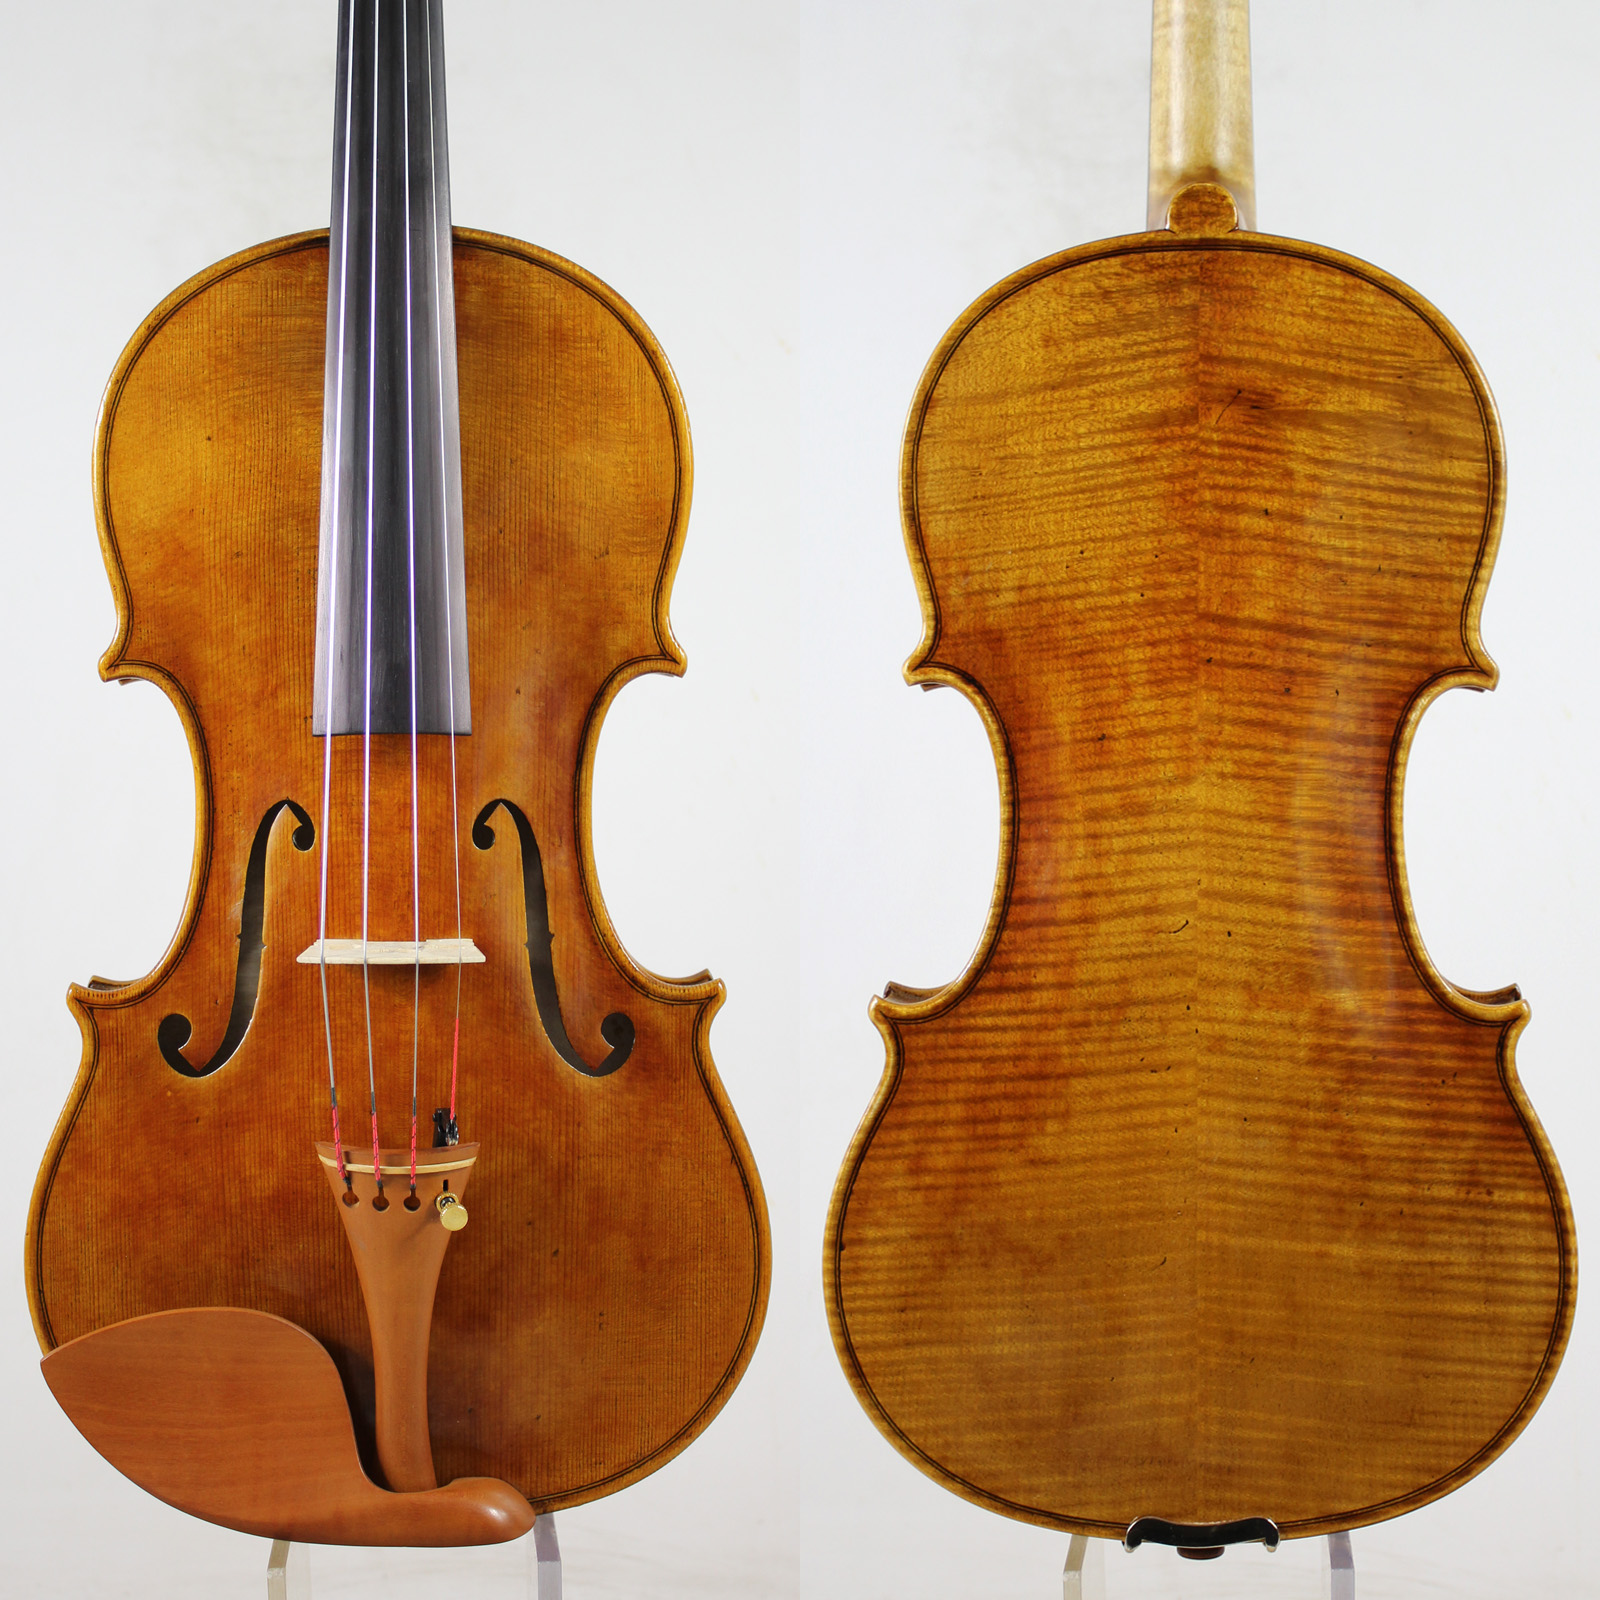 Copy Guarnieri 'del Gesu' Violin Violino #182 Professional Violin Musical Instrument+Case, Bow,Free Shipping!